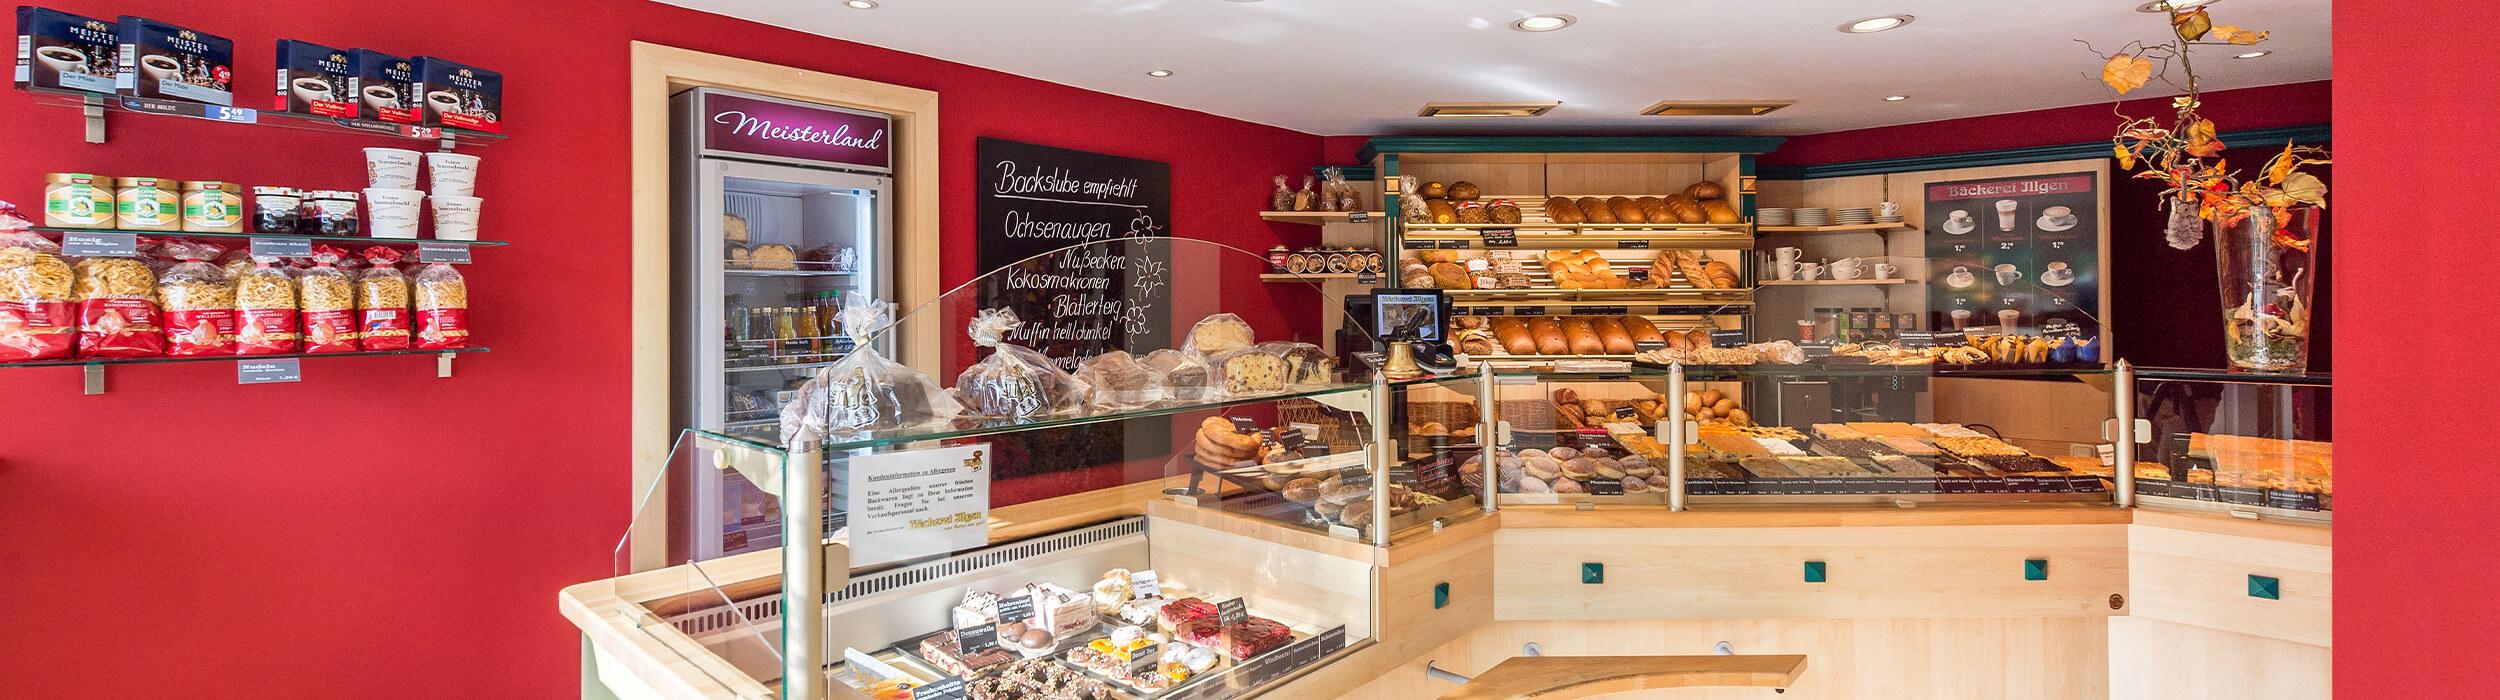 Bäckerei Illgen - Standort Großschirma